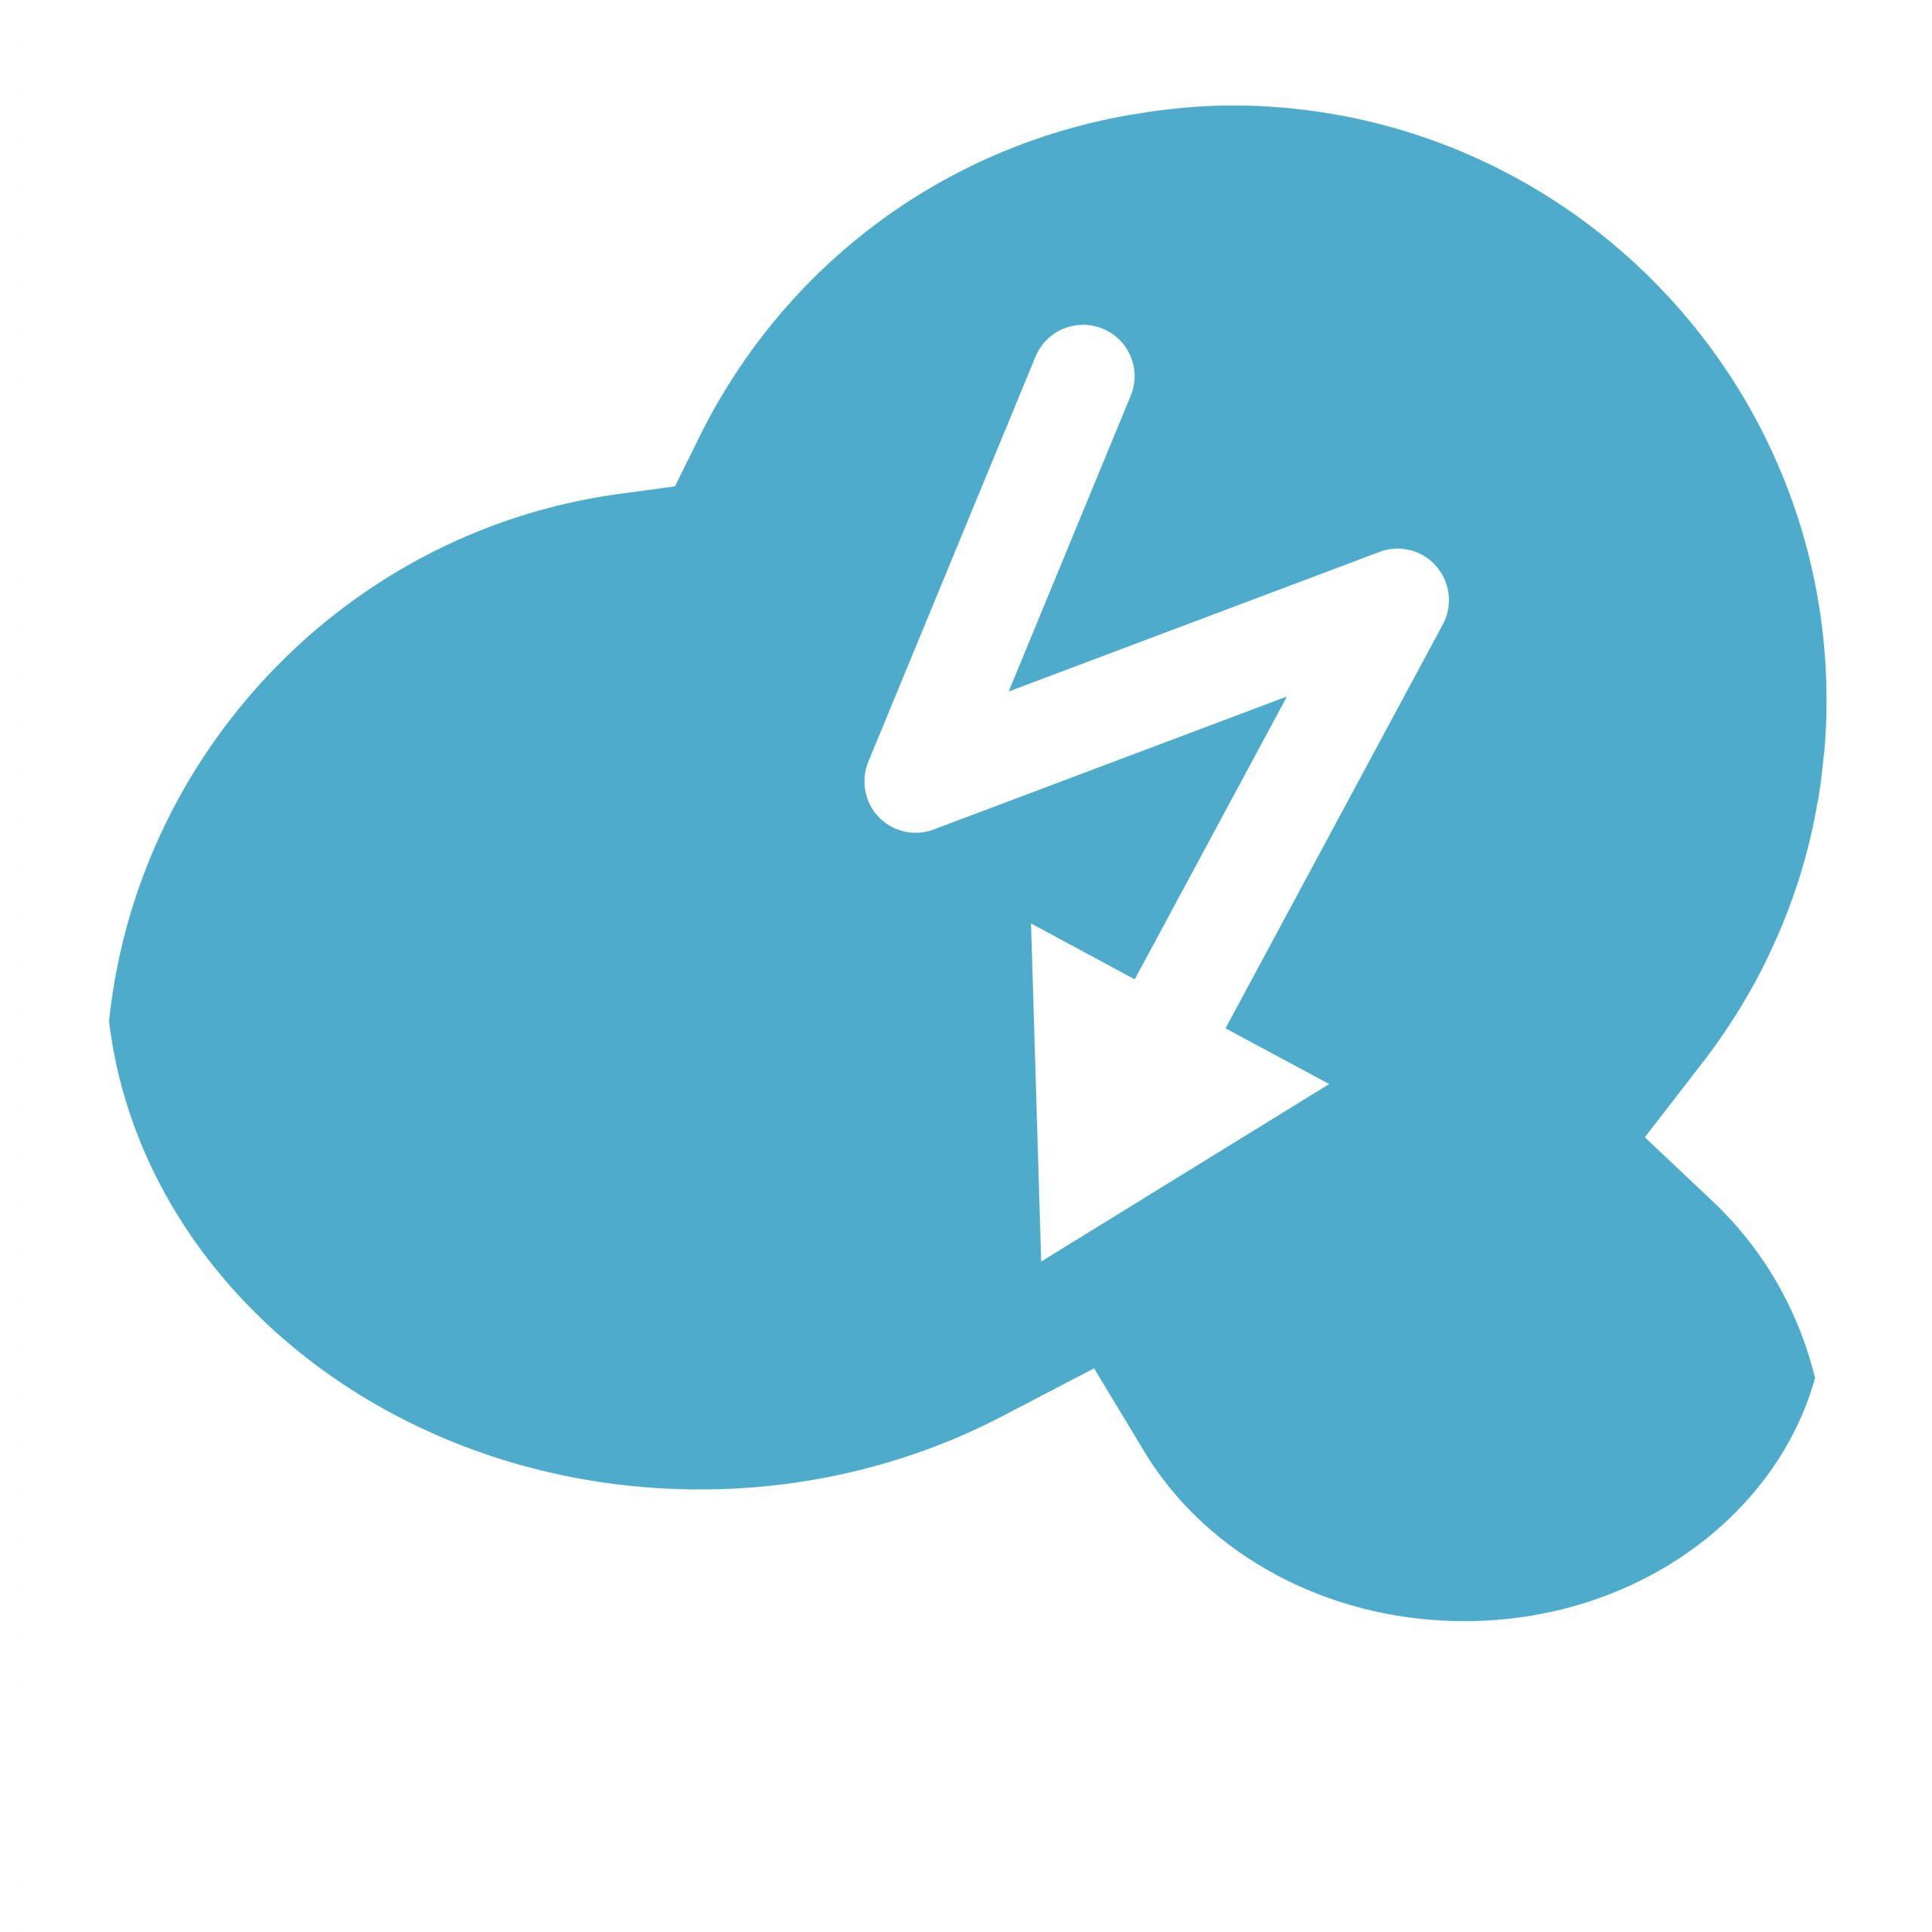 cropped-cropped-CC-logo.jpg